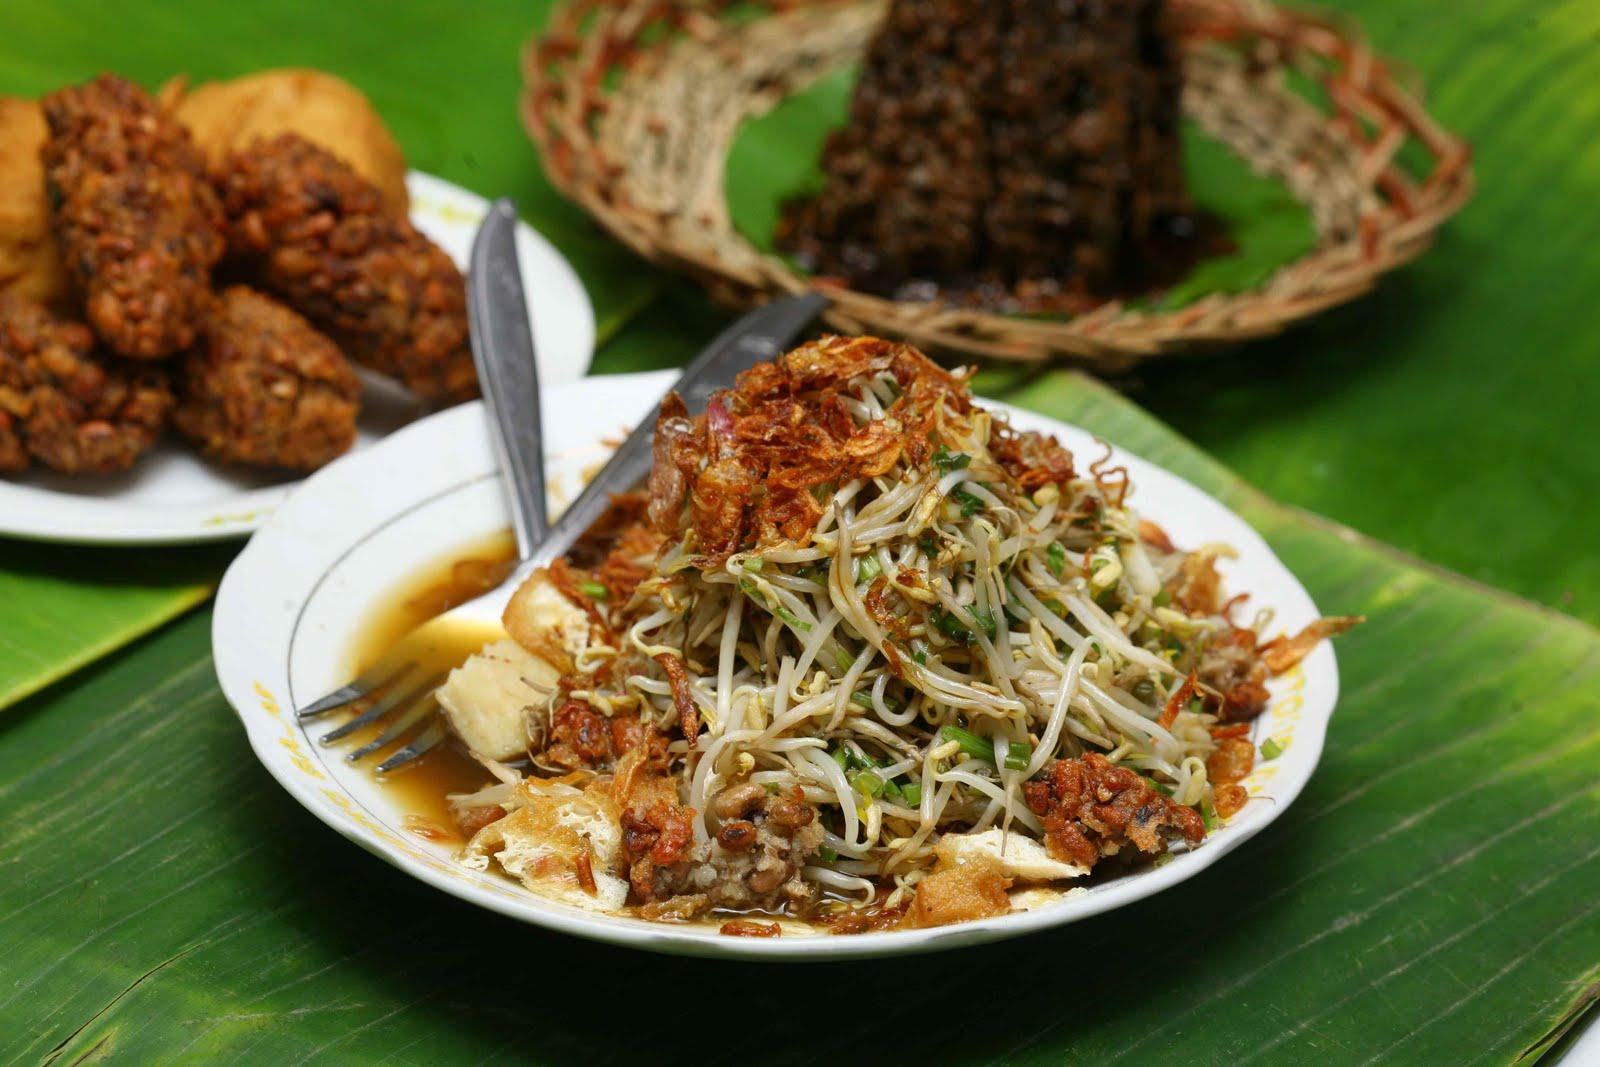 Resep-Rawon-Daging-Khas-Surabaya